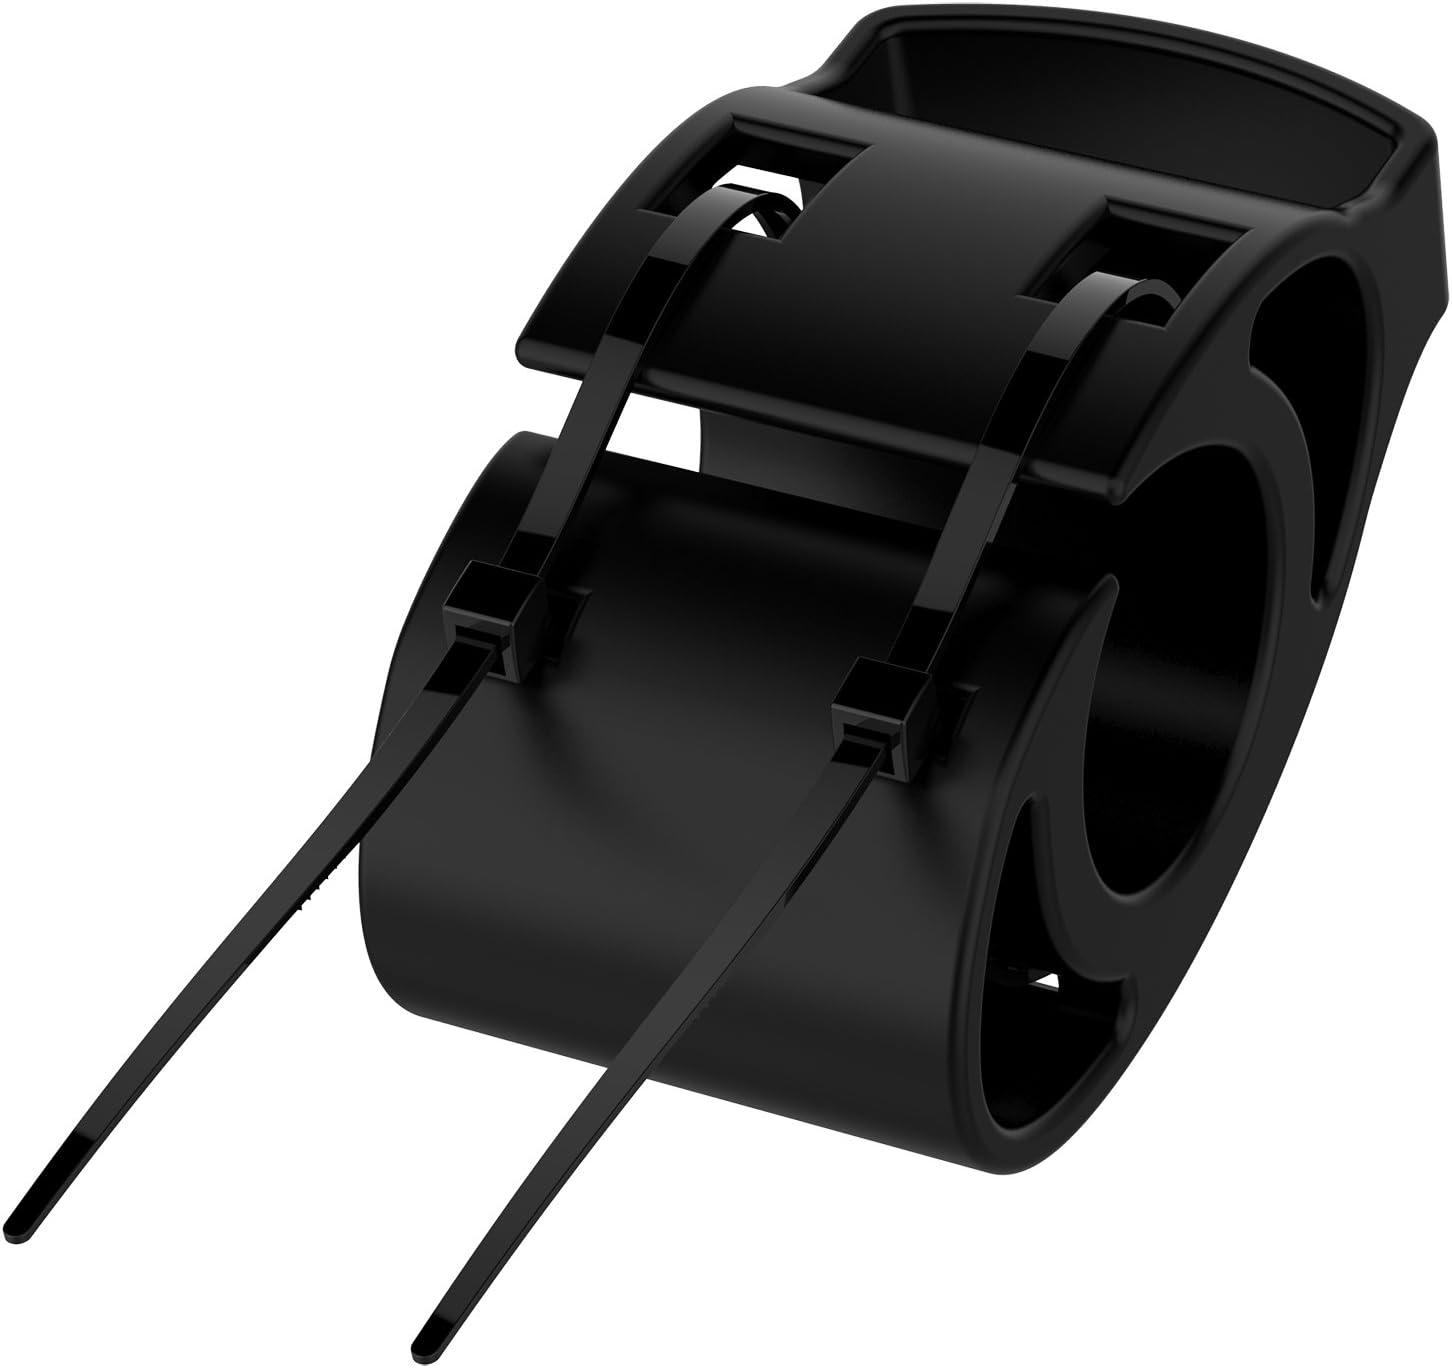 TenCloud Quick Release Bicycle Handlebar Mount Bracket Kit w/Zip Ties Replacement for Garmin Forerunner,Approach,Fenix Watches